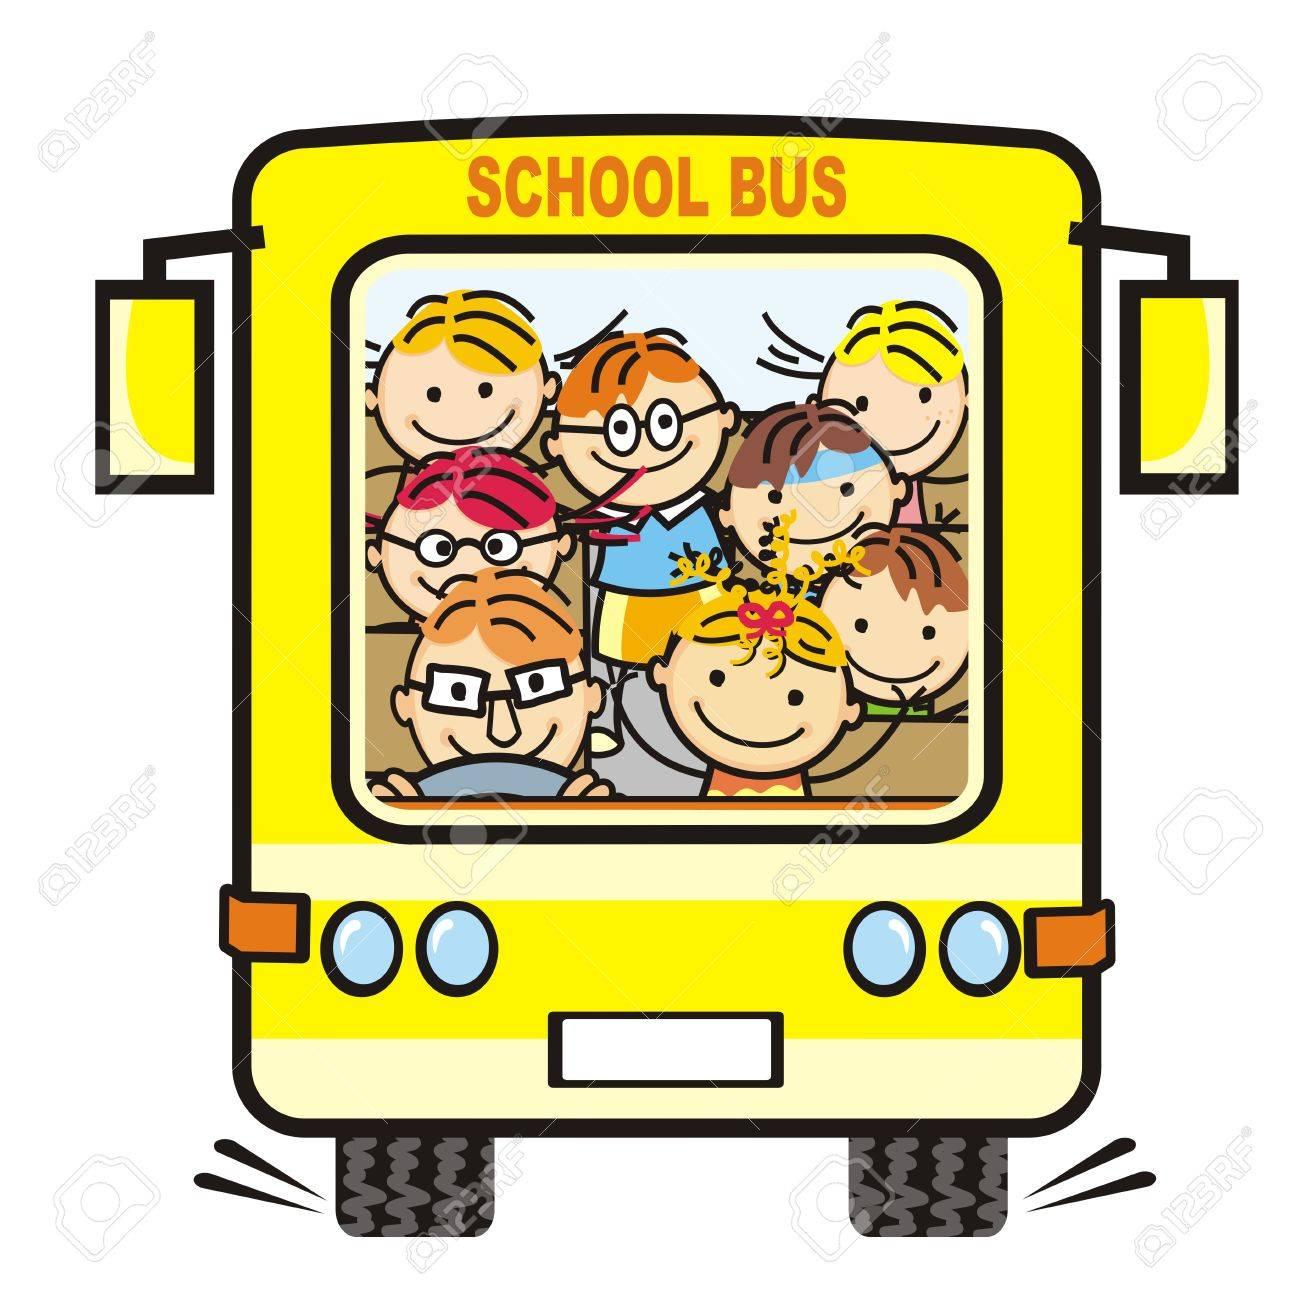 yellow school bus and children icon humorous illustration royalty